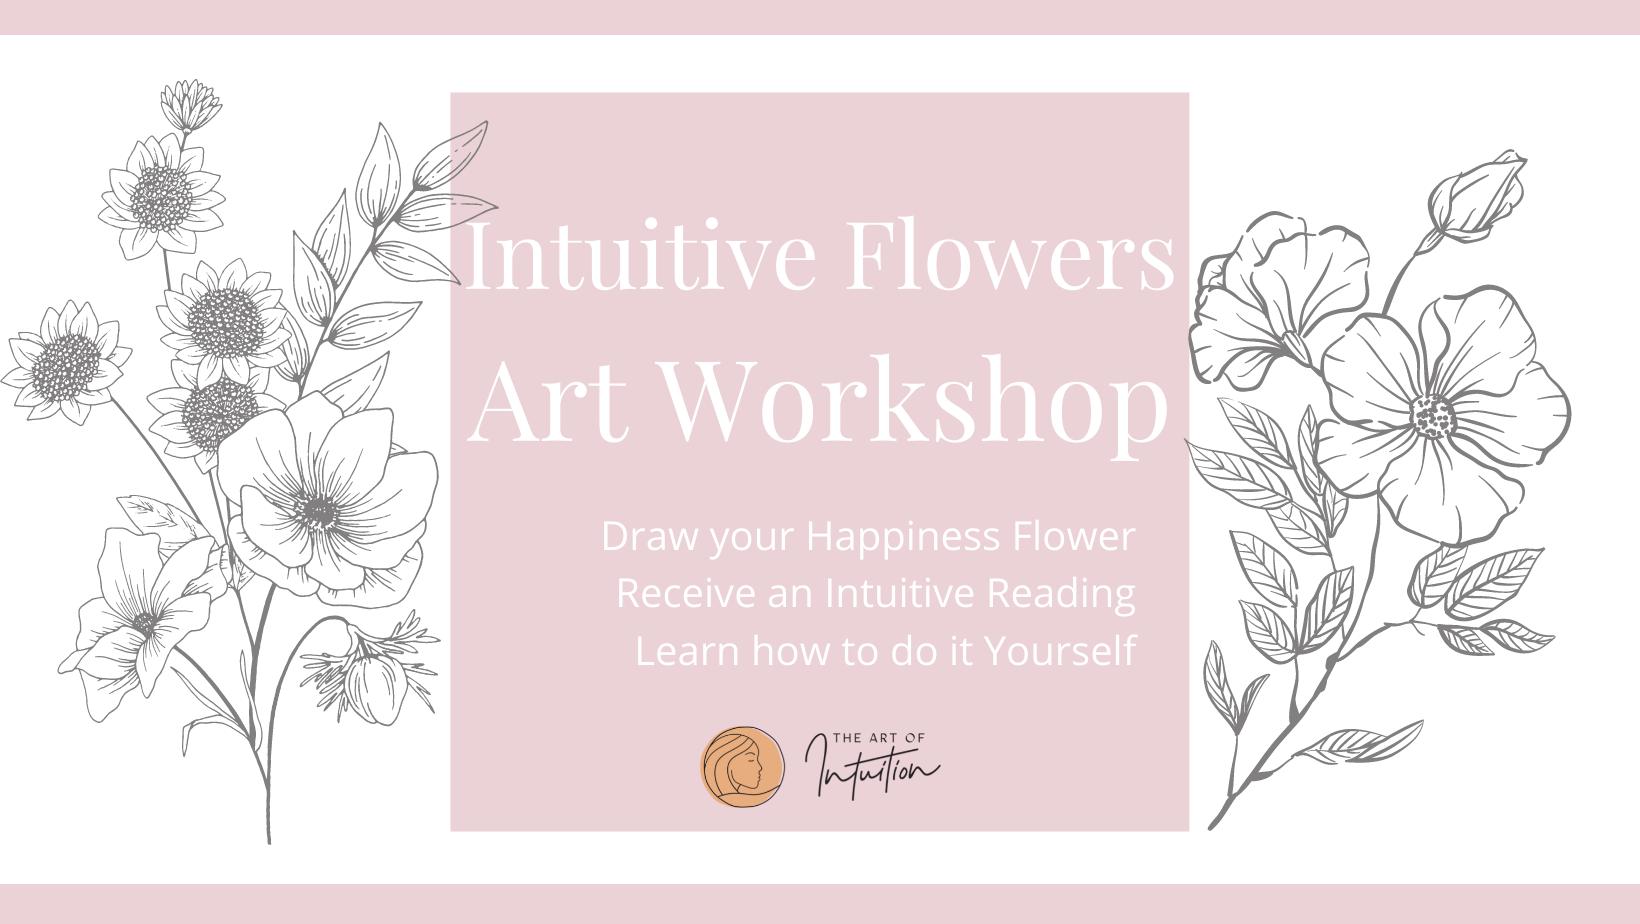 Intuitive Flowers Art Reading Workshops